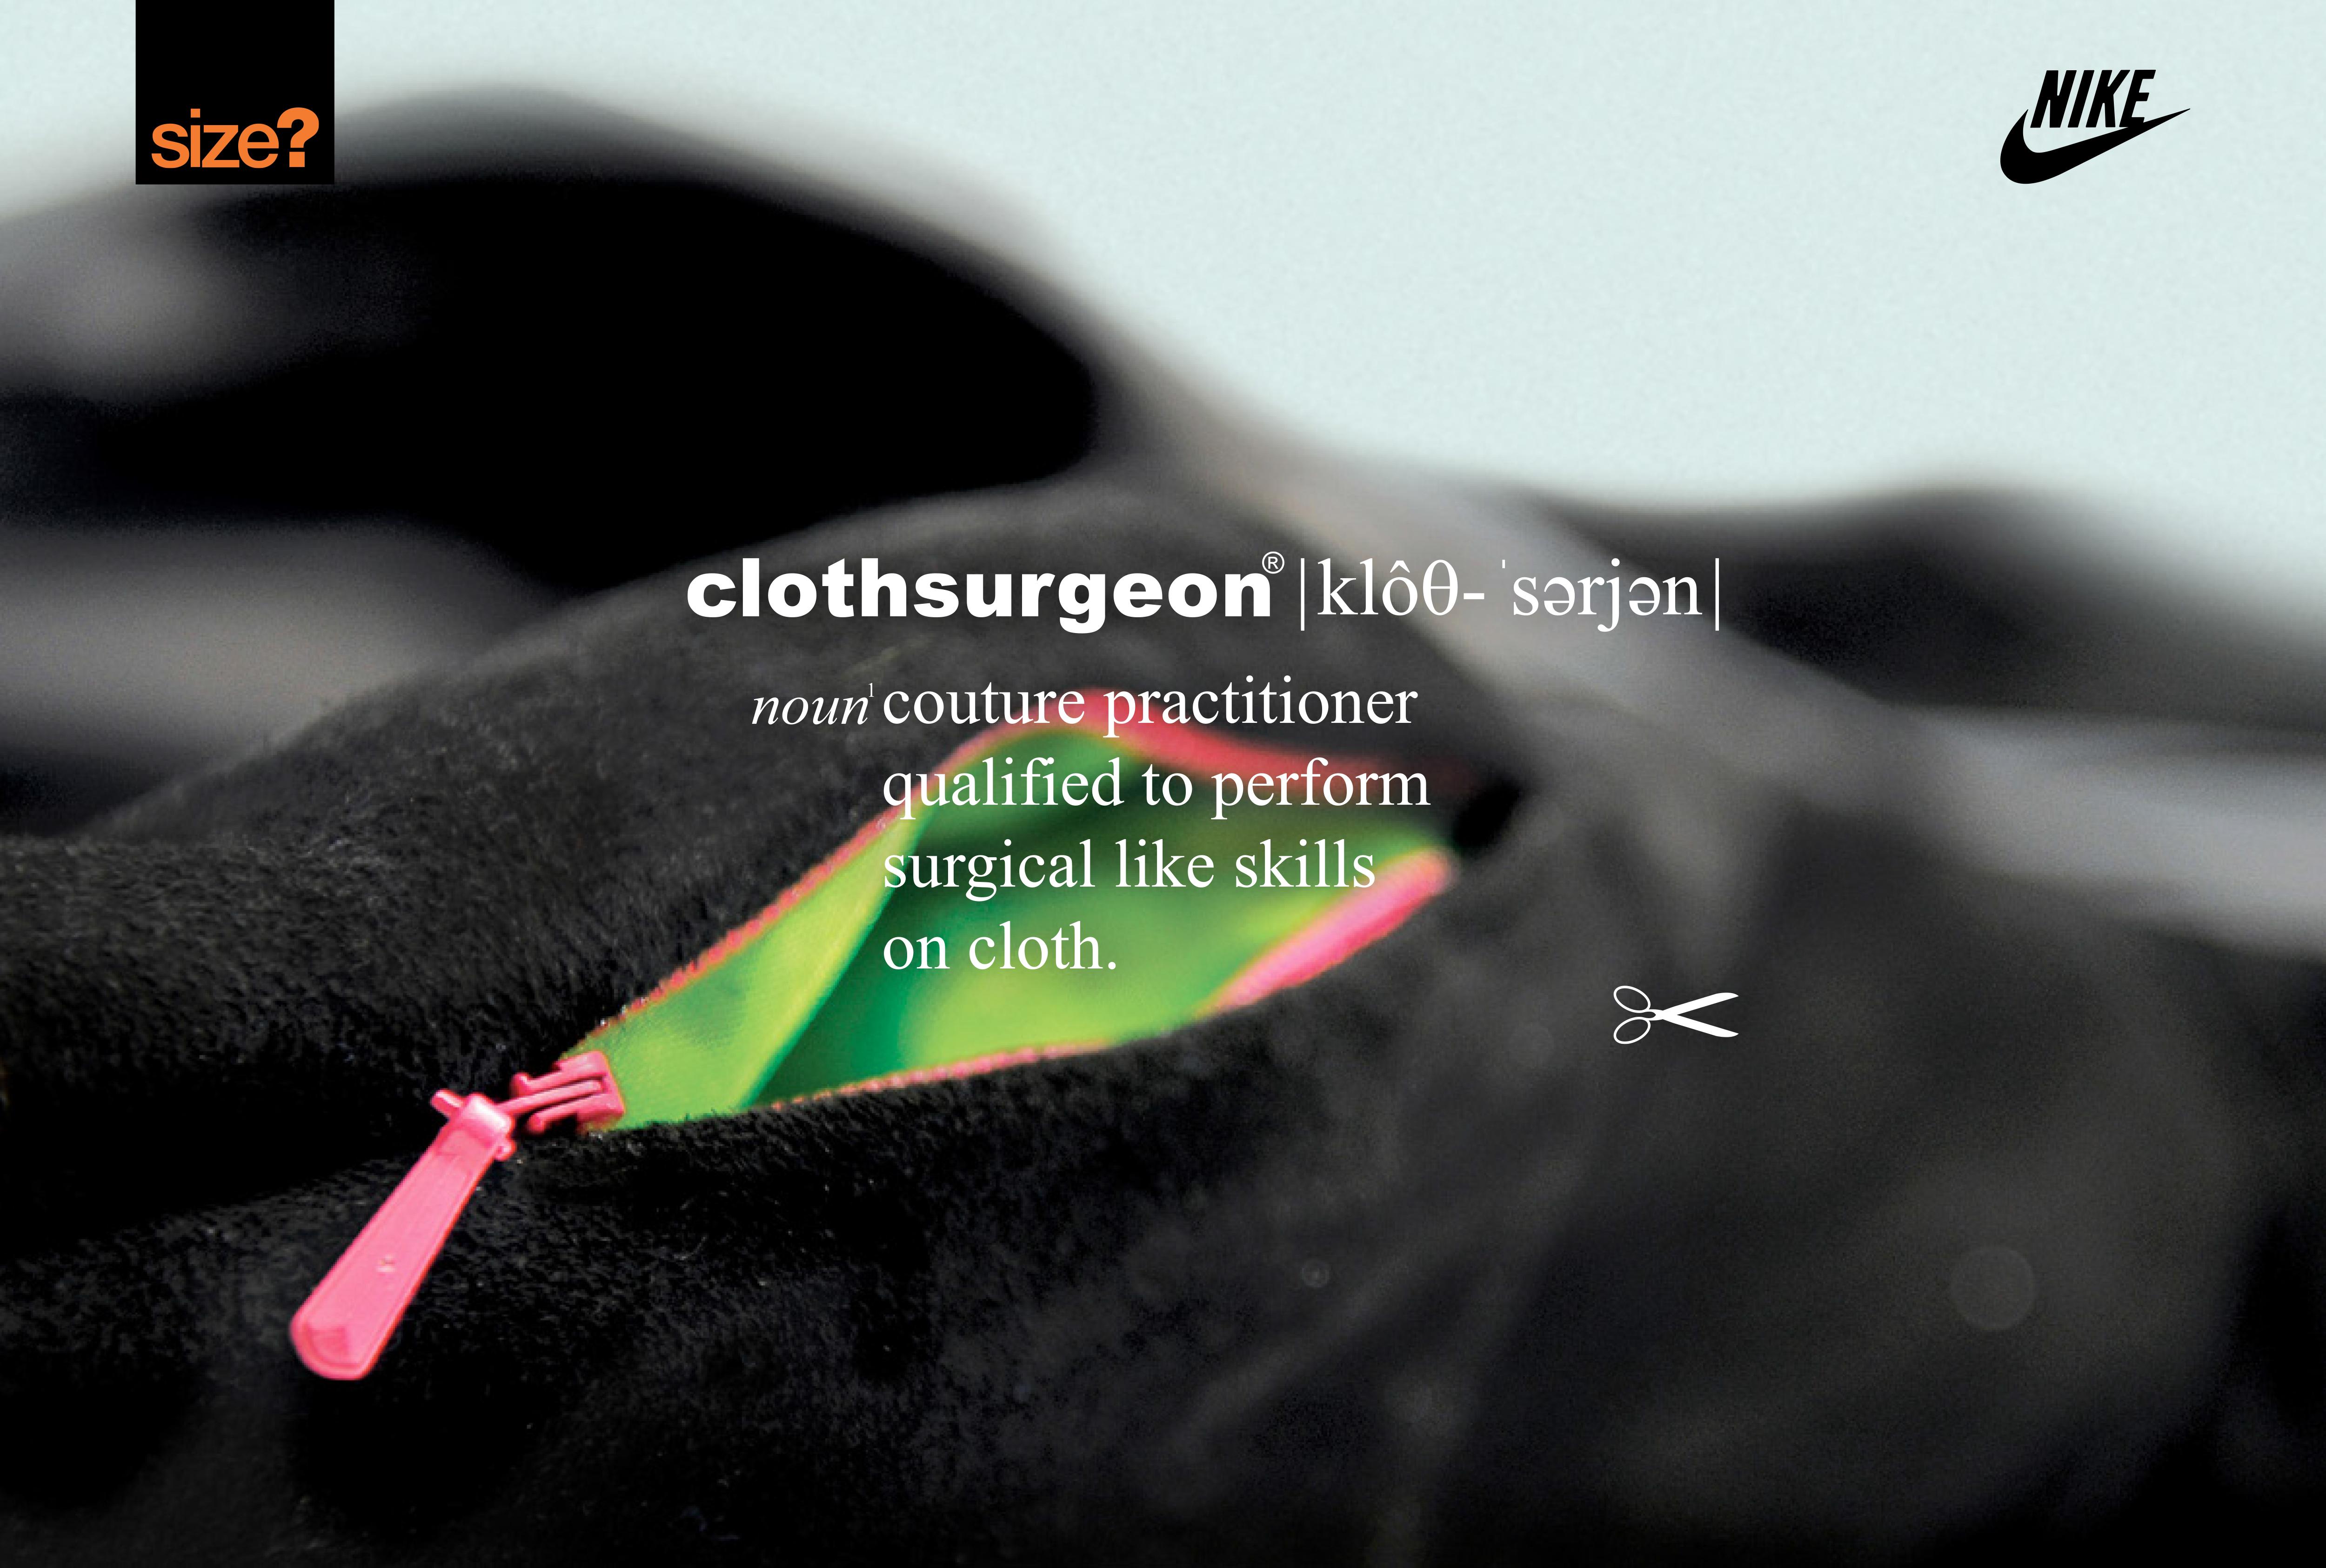 Nike x size? x Clothsurgeon 'Urban Safari' competition